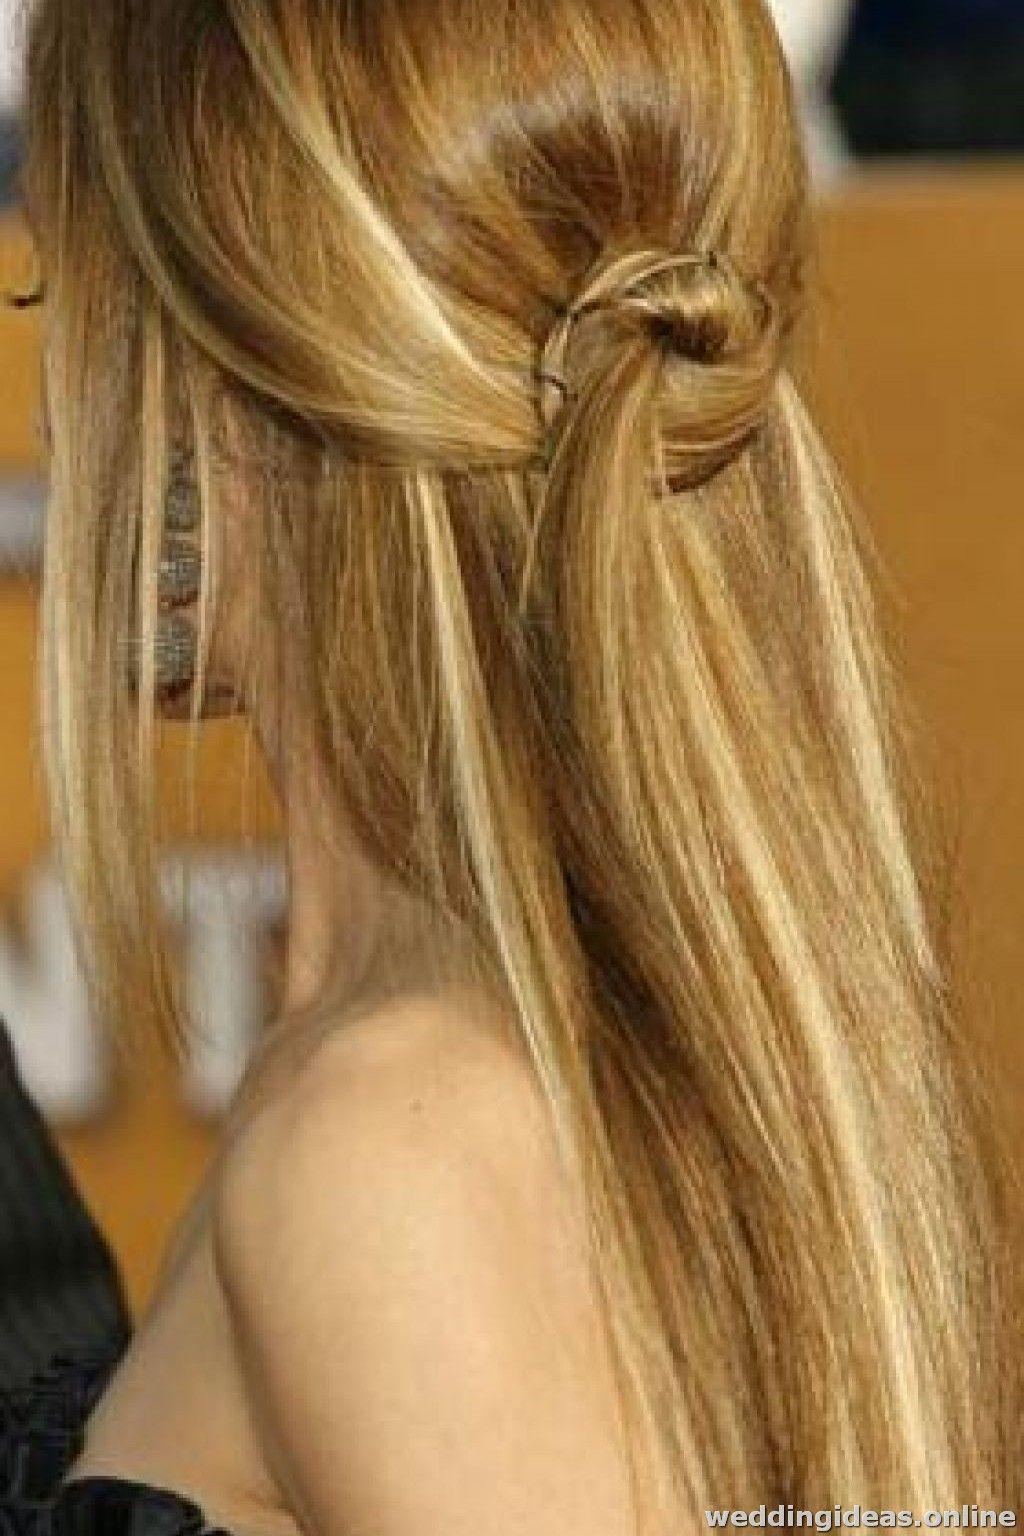 50 Schonsten Ideen Fur Brautfrisuren Frisuren Lange Gerade Haare Brautfrisuren Glatte Haare Brautfrisur